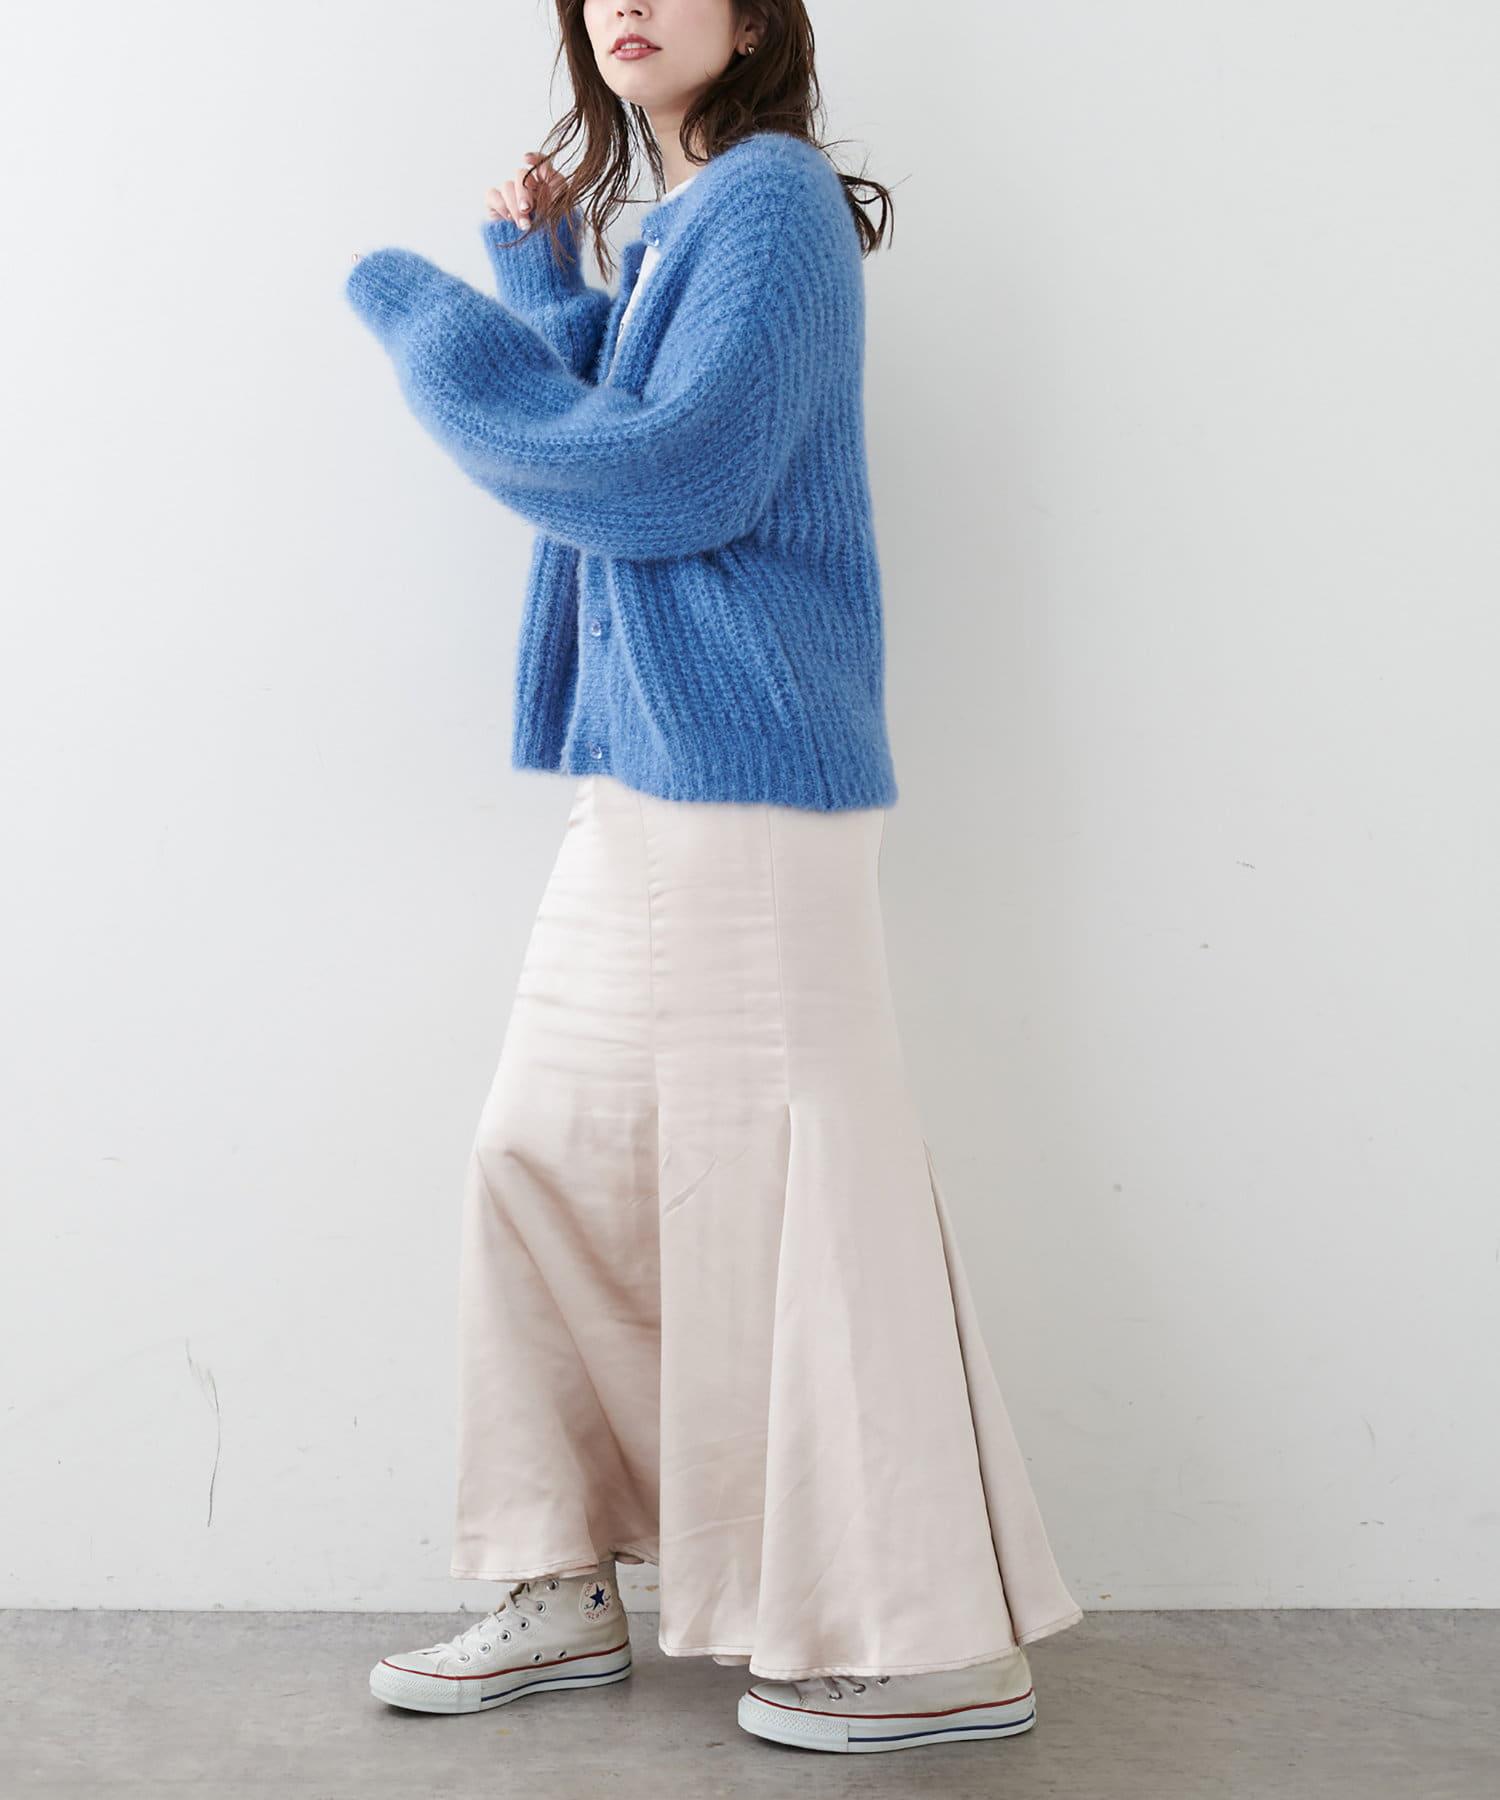 natural couture(ナチュラルクチュール) 【着用動画あり】クリア釦ふわモコカラーカーディガン